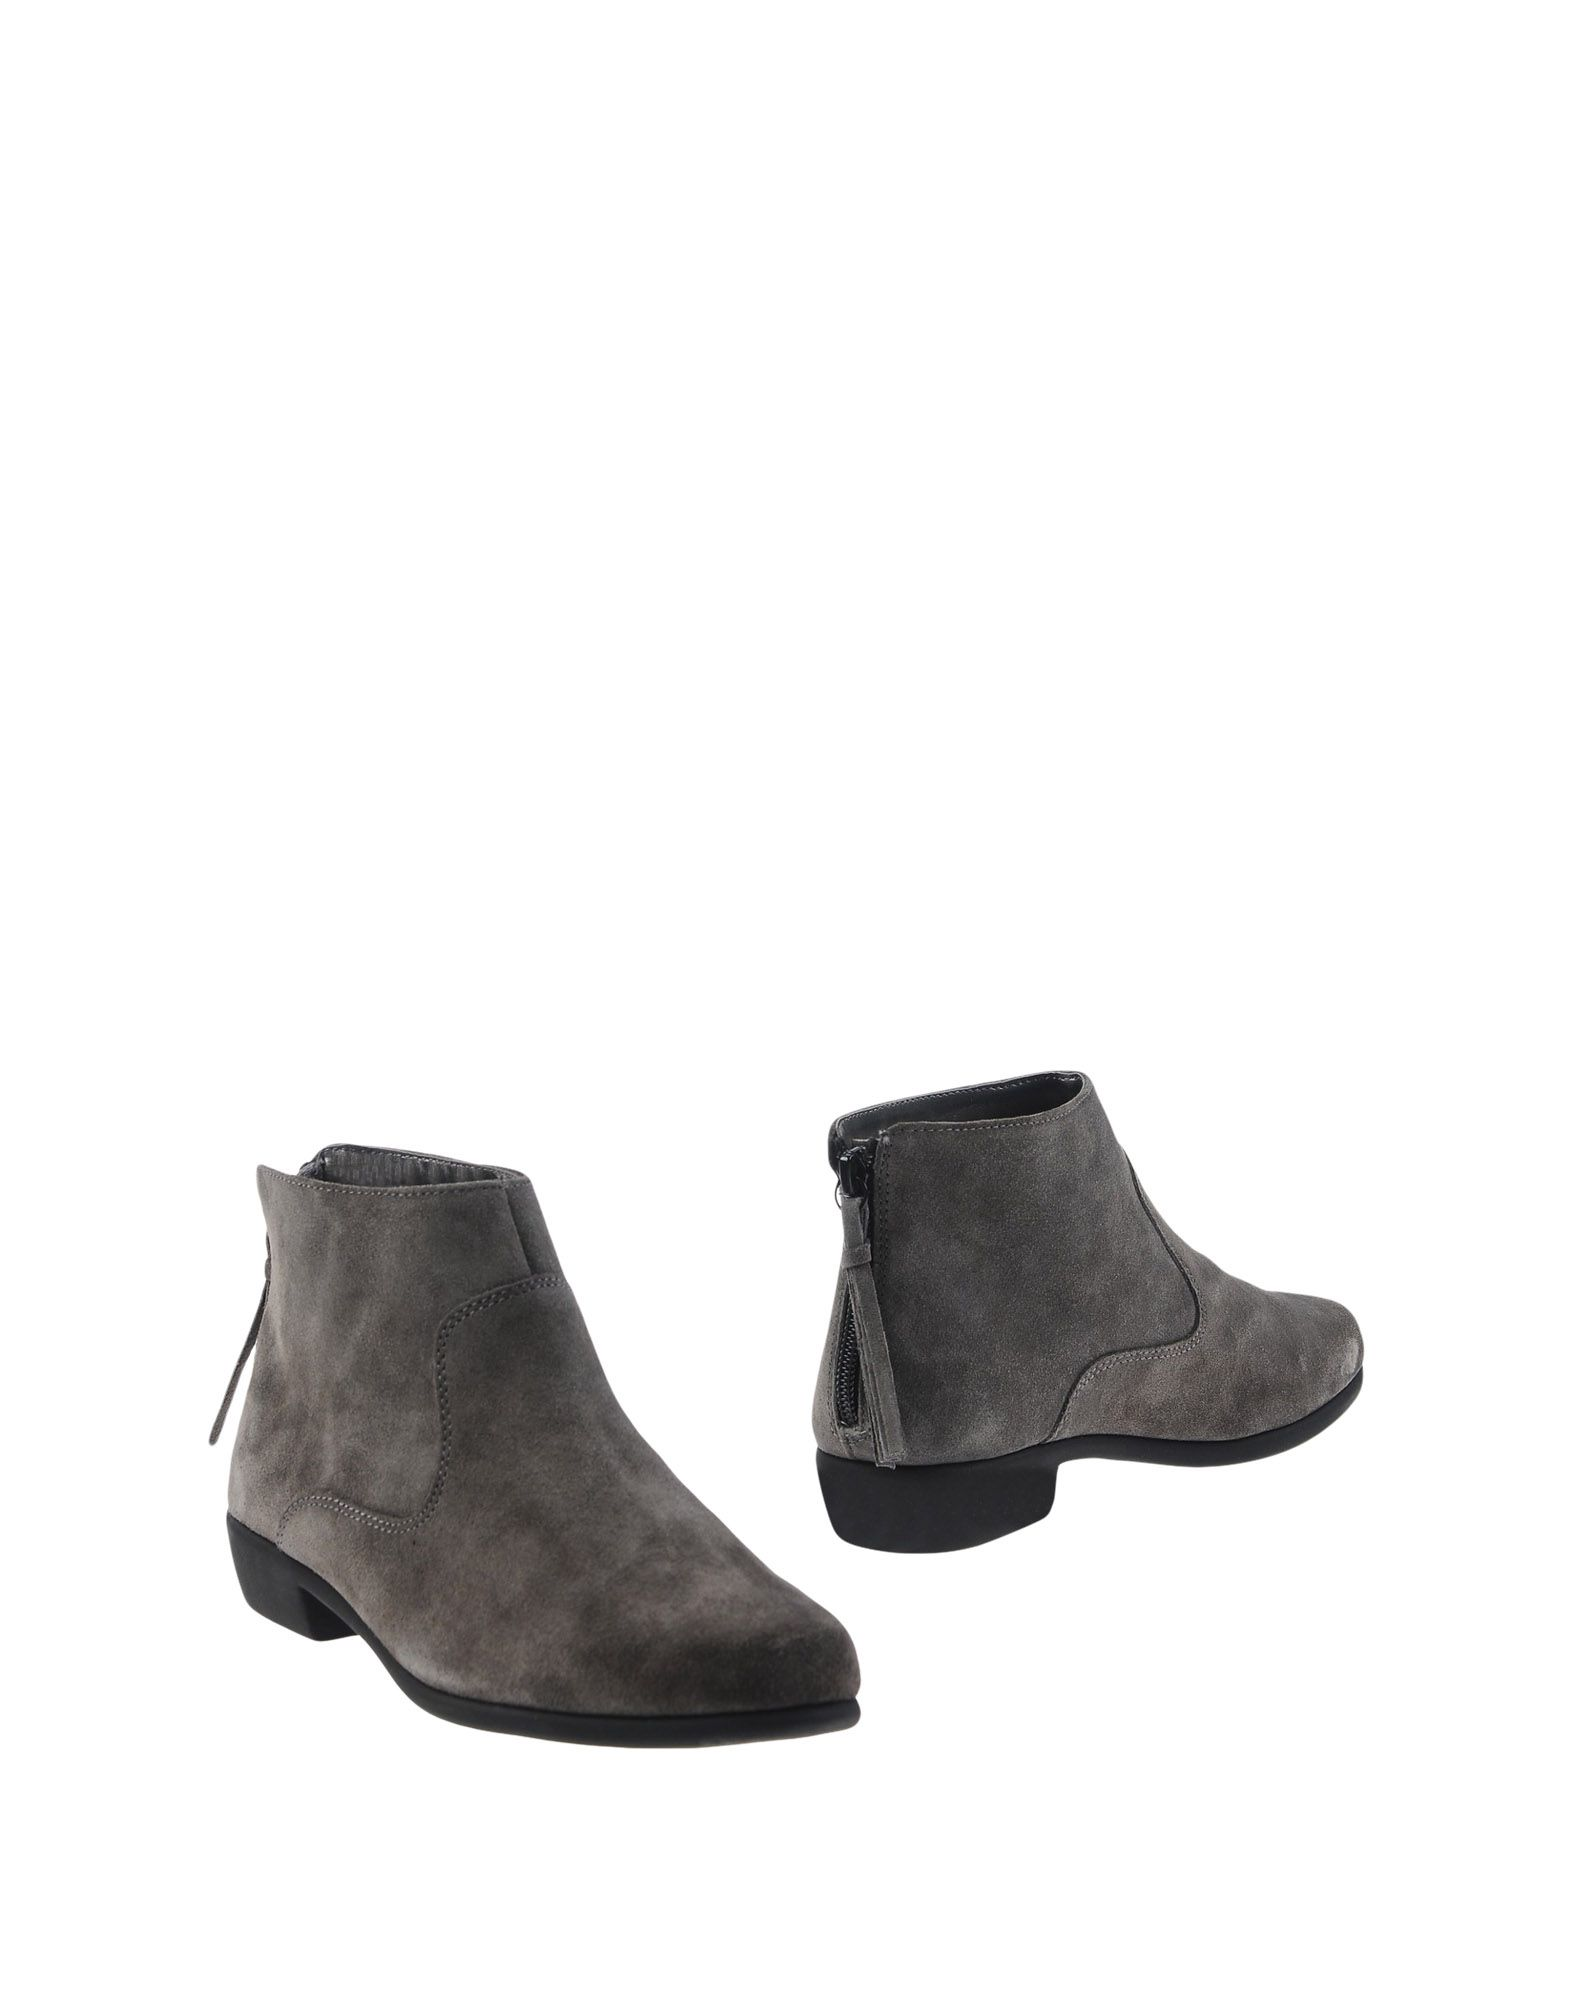 Lumberjack Stiefelette Damen  11288813HU Heiße Schuhe Schuhe Schuhe b0467a